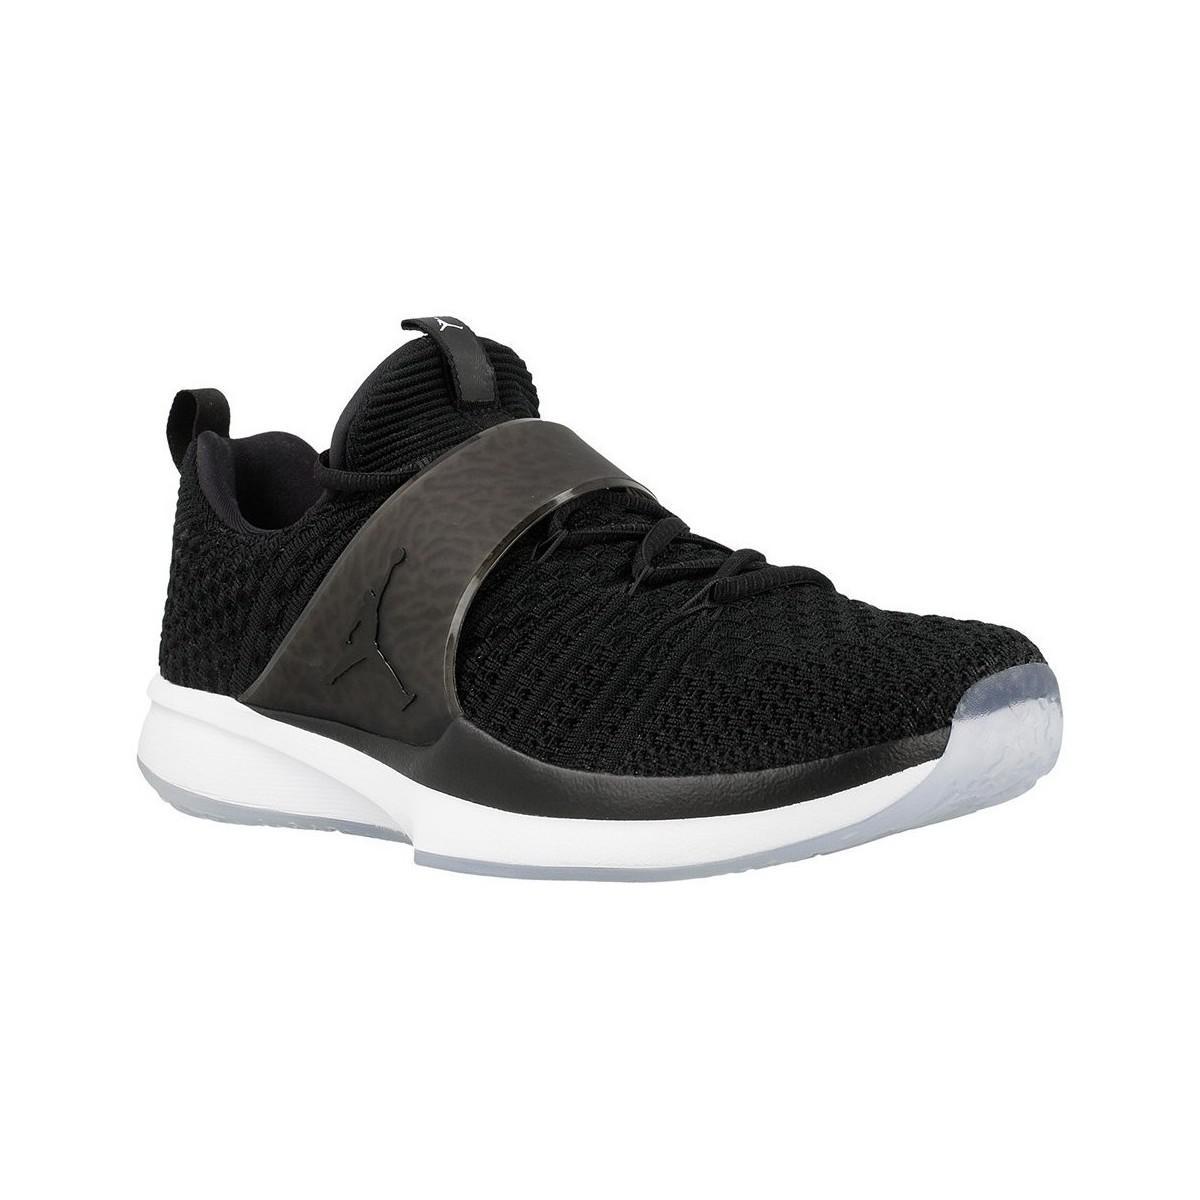 Nike Jordan Trainer 2 Flyknit Men s Shoes (trainers) In White in ... 2264a5433